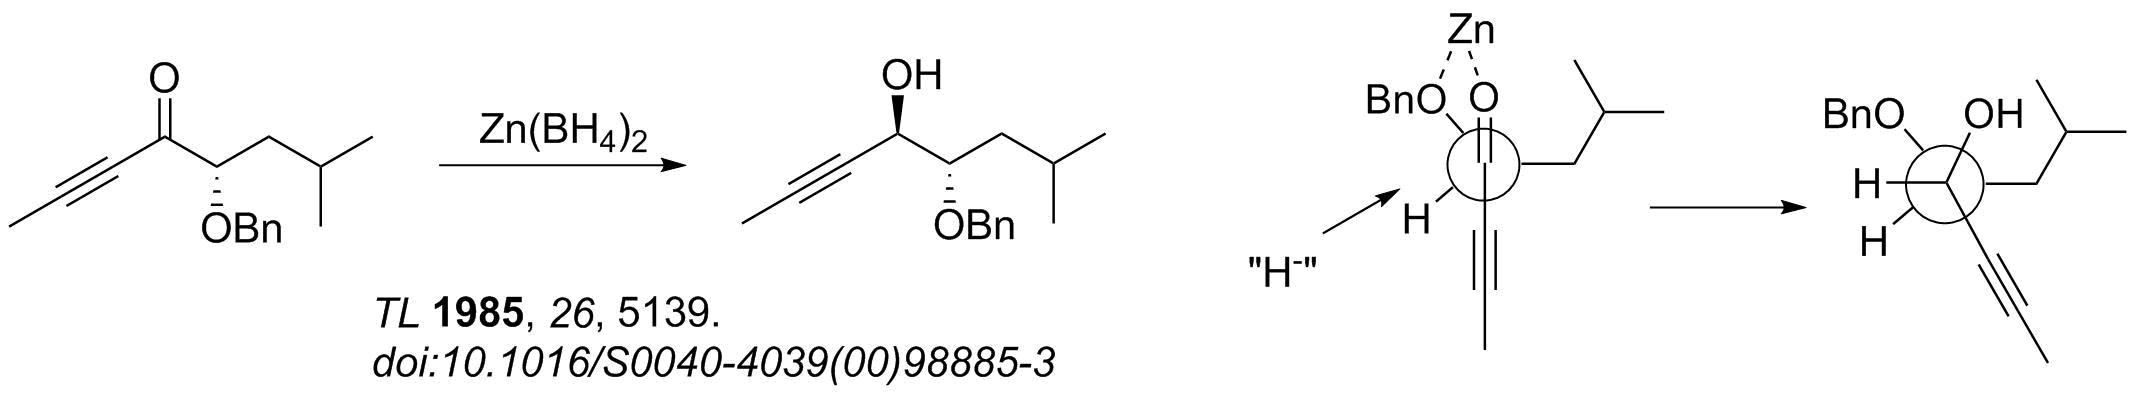 Carbonyl Addition 2